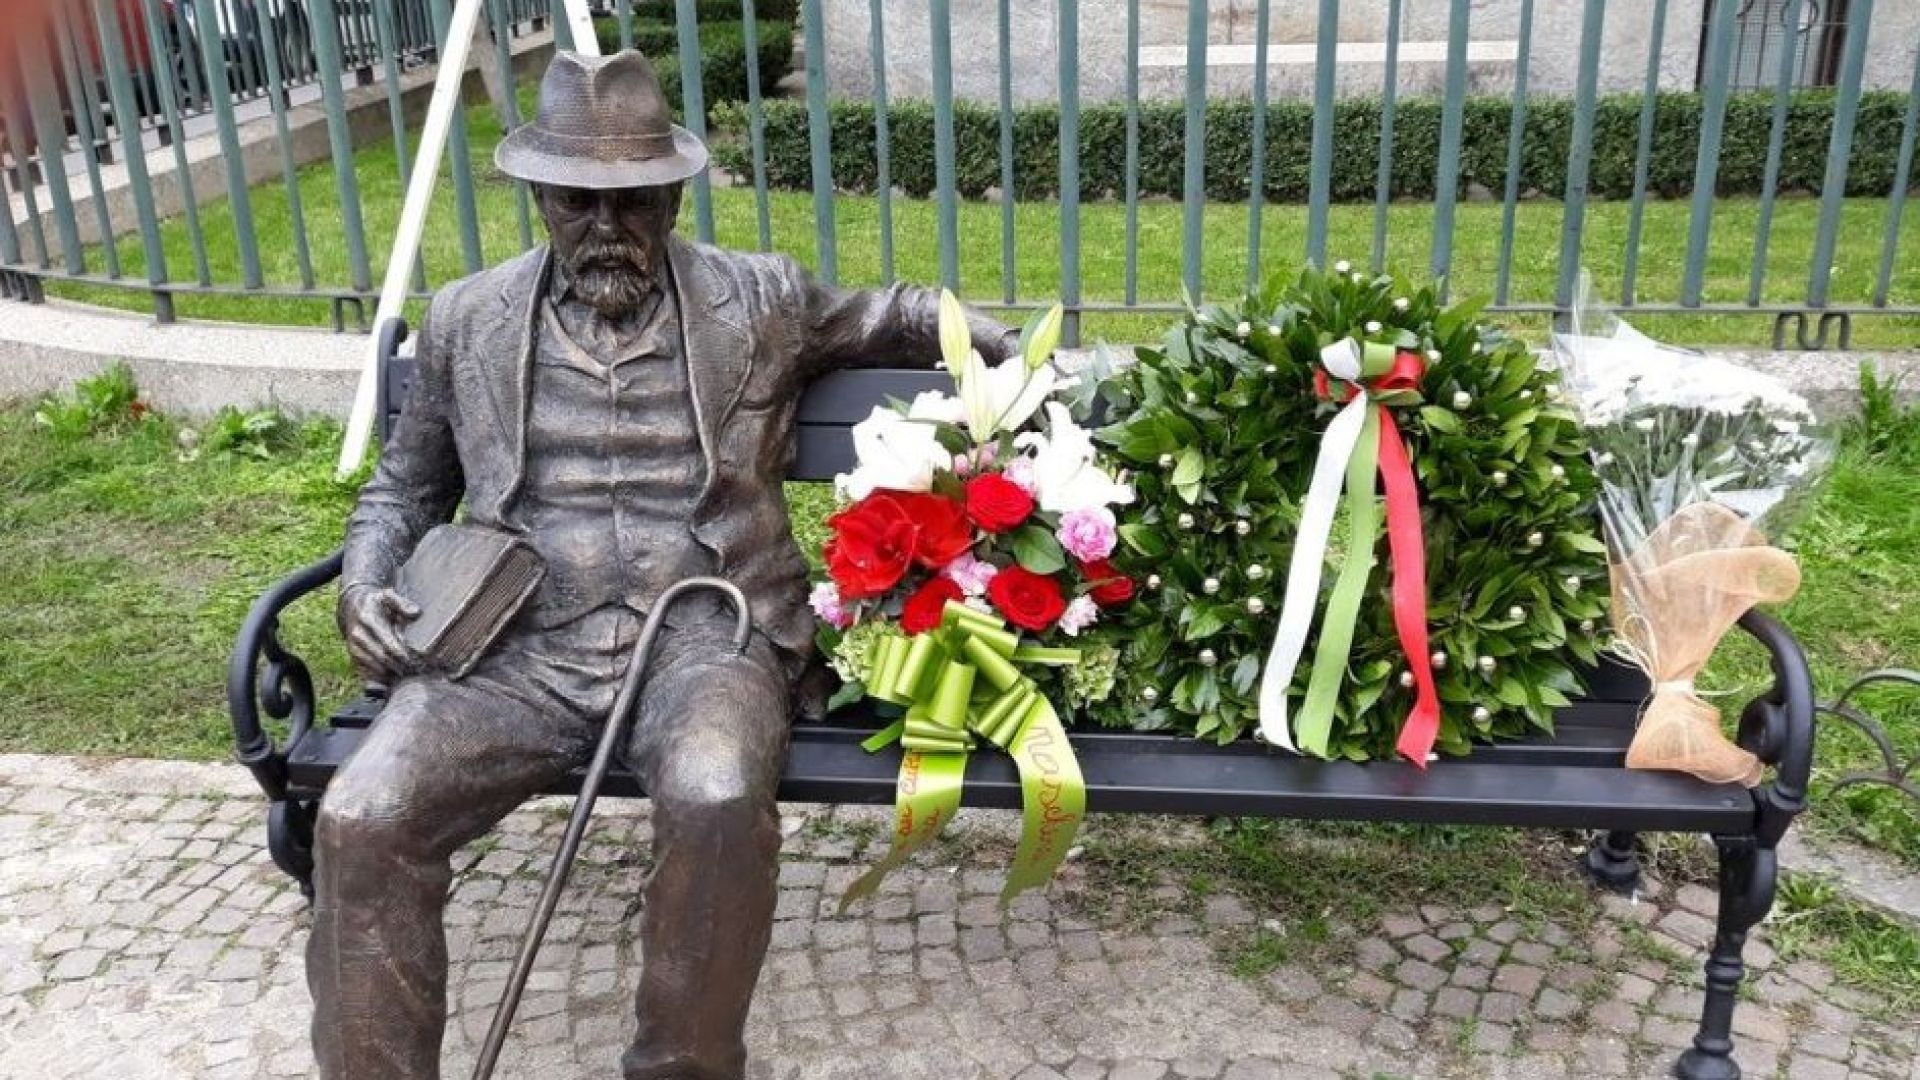 Откриха паметник на Пенчо Славейков в Милано